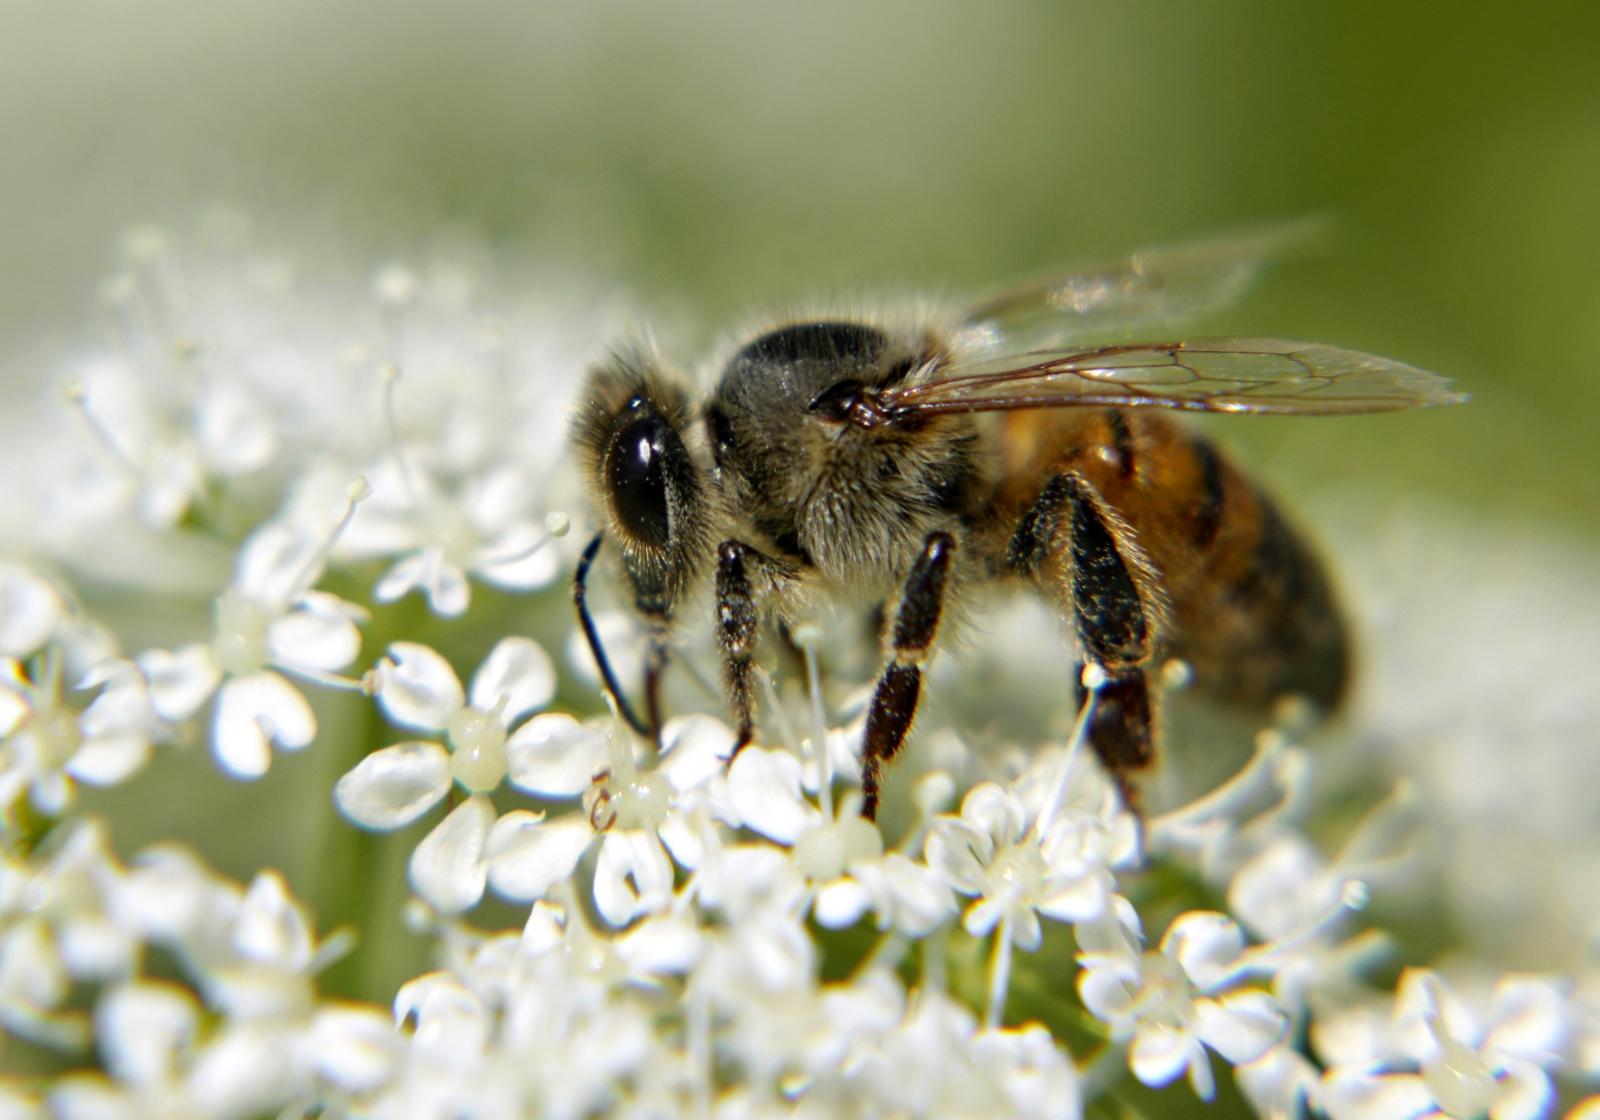 Harm Wild Bees Too